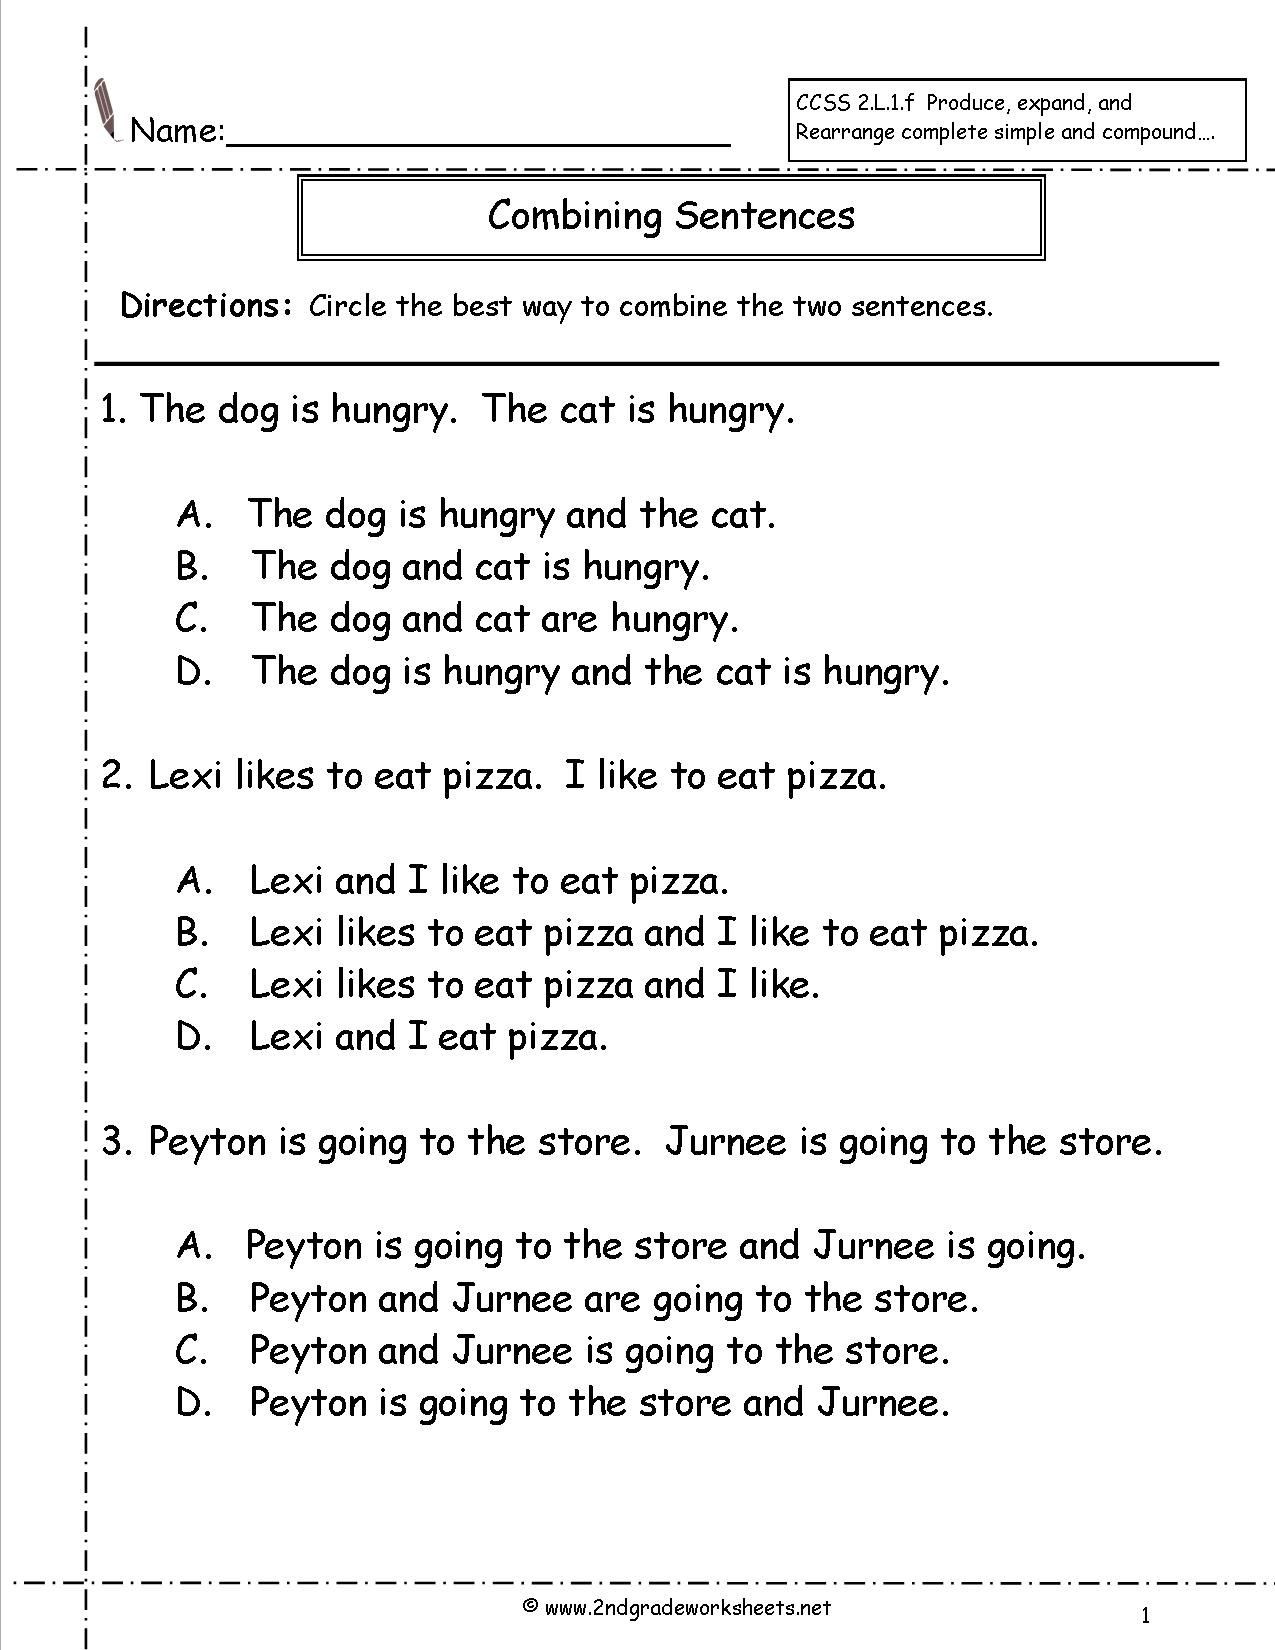 Combining Sentences Worksheet 3rd Grade Bining Sentences Worksheet with Images